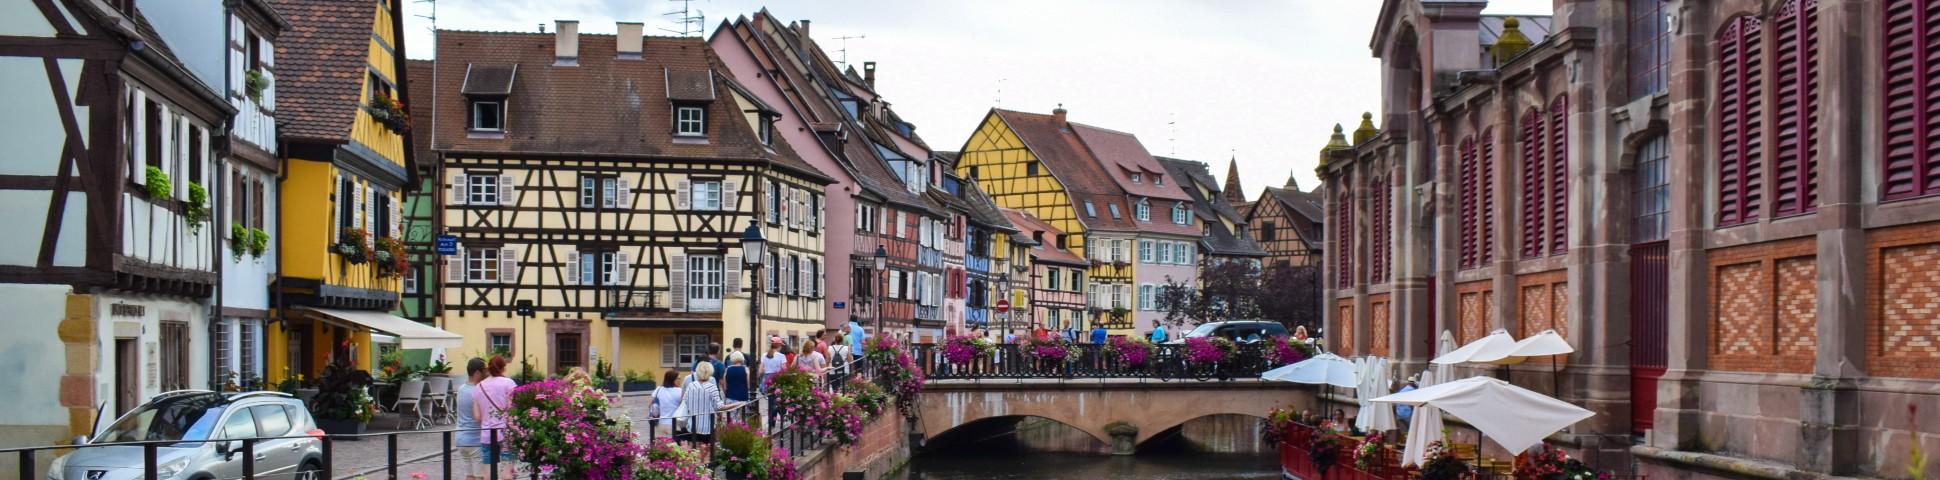 Beautiful village in Alsace-Lorraine region